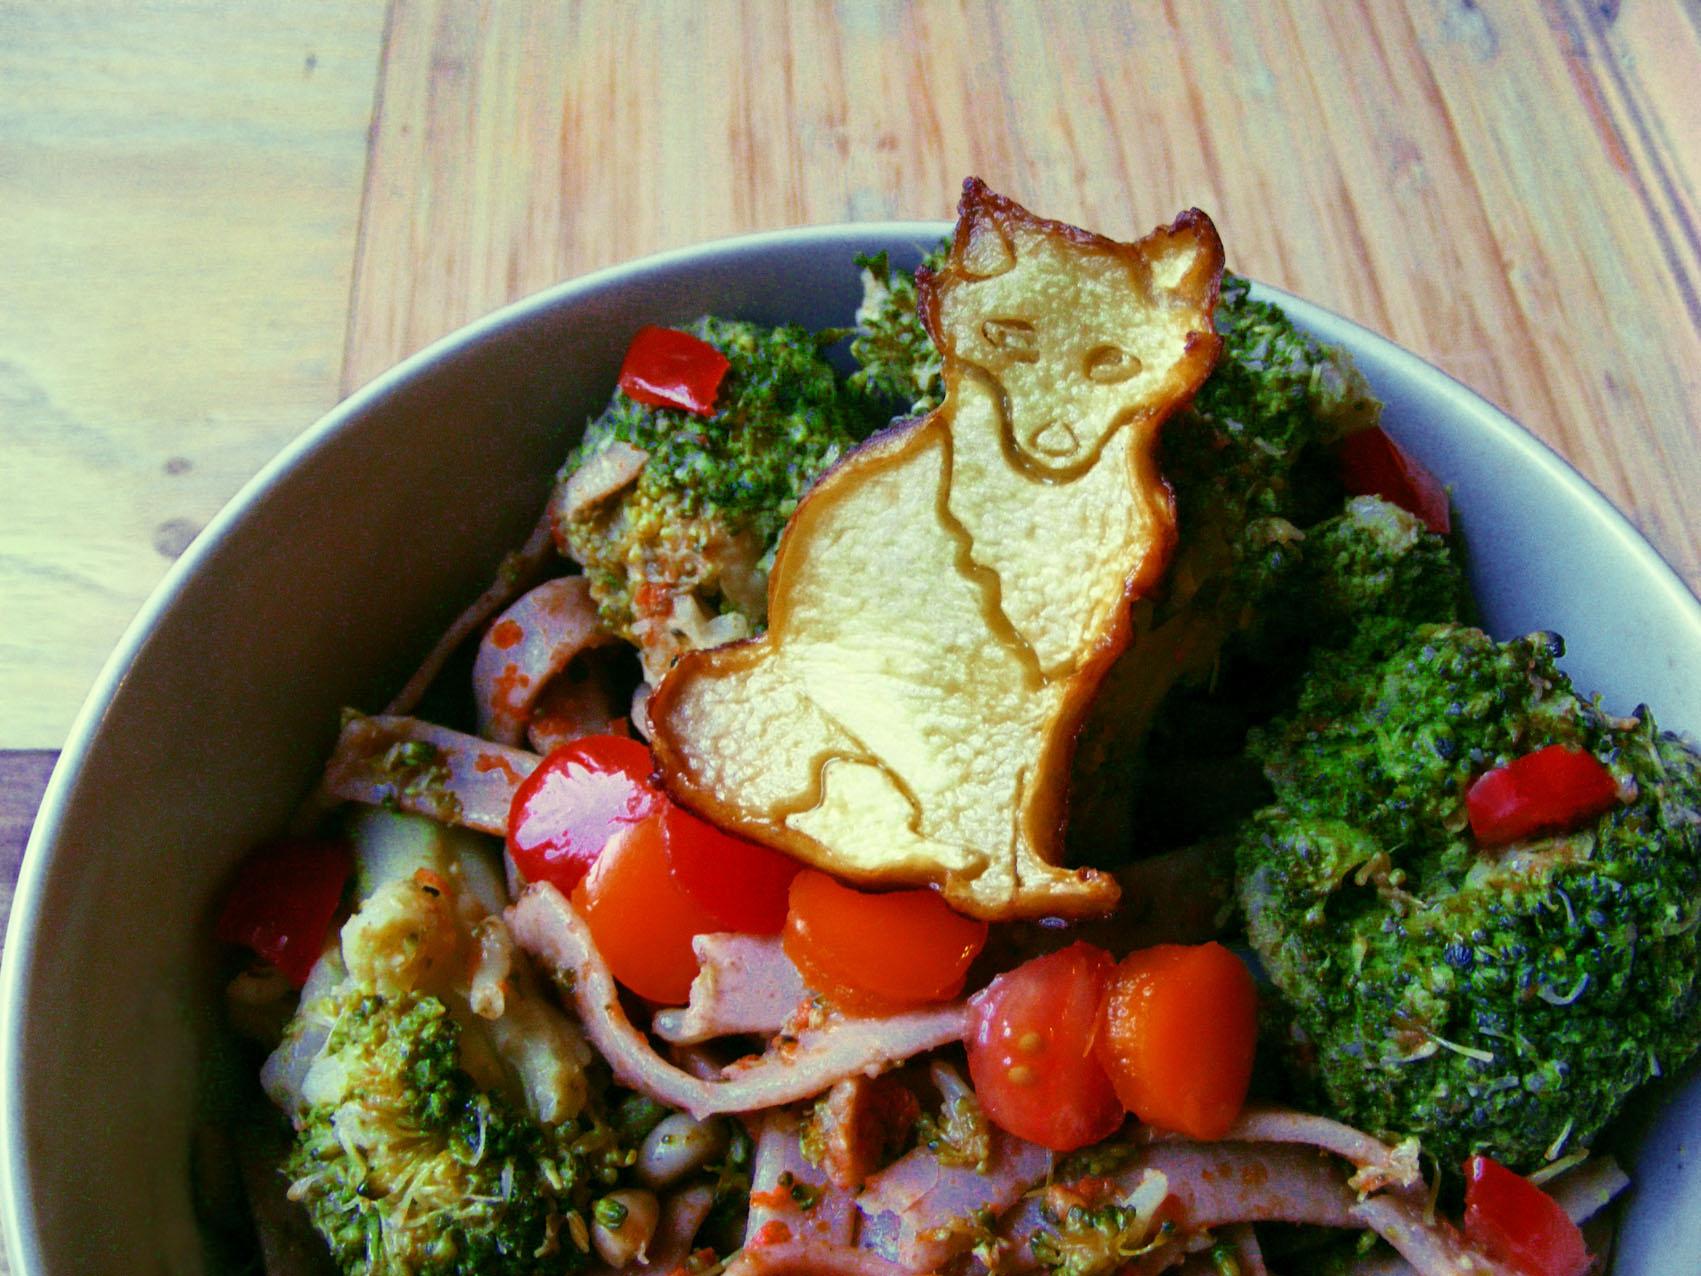 Verbazingwekkend 7 leuke ideeën om eten te presenteren - Tea Boon IH-81